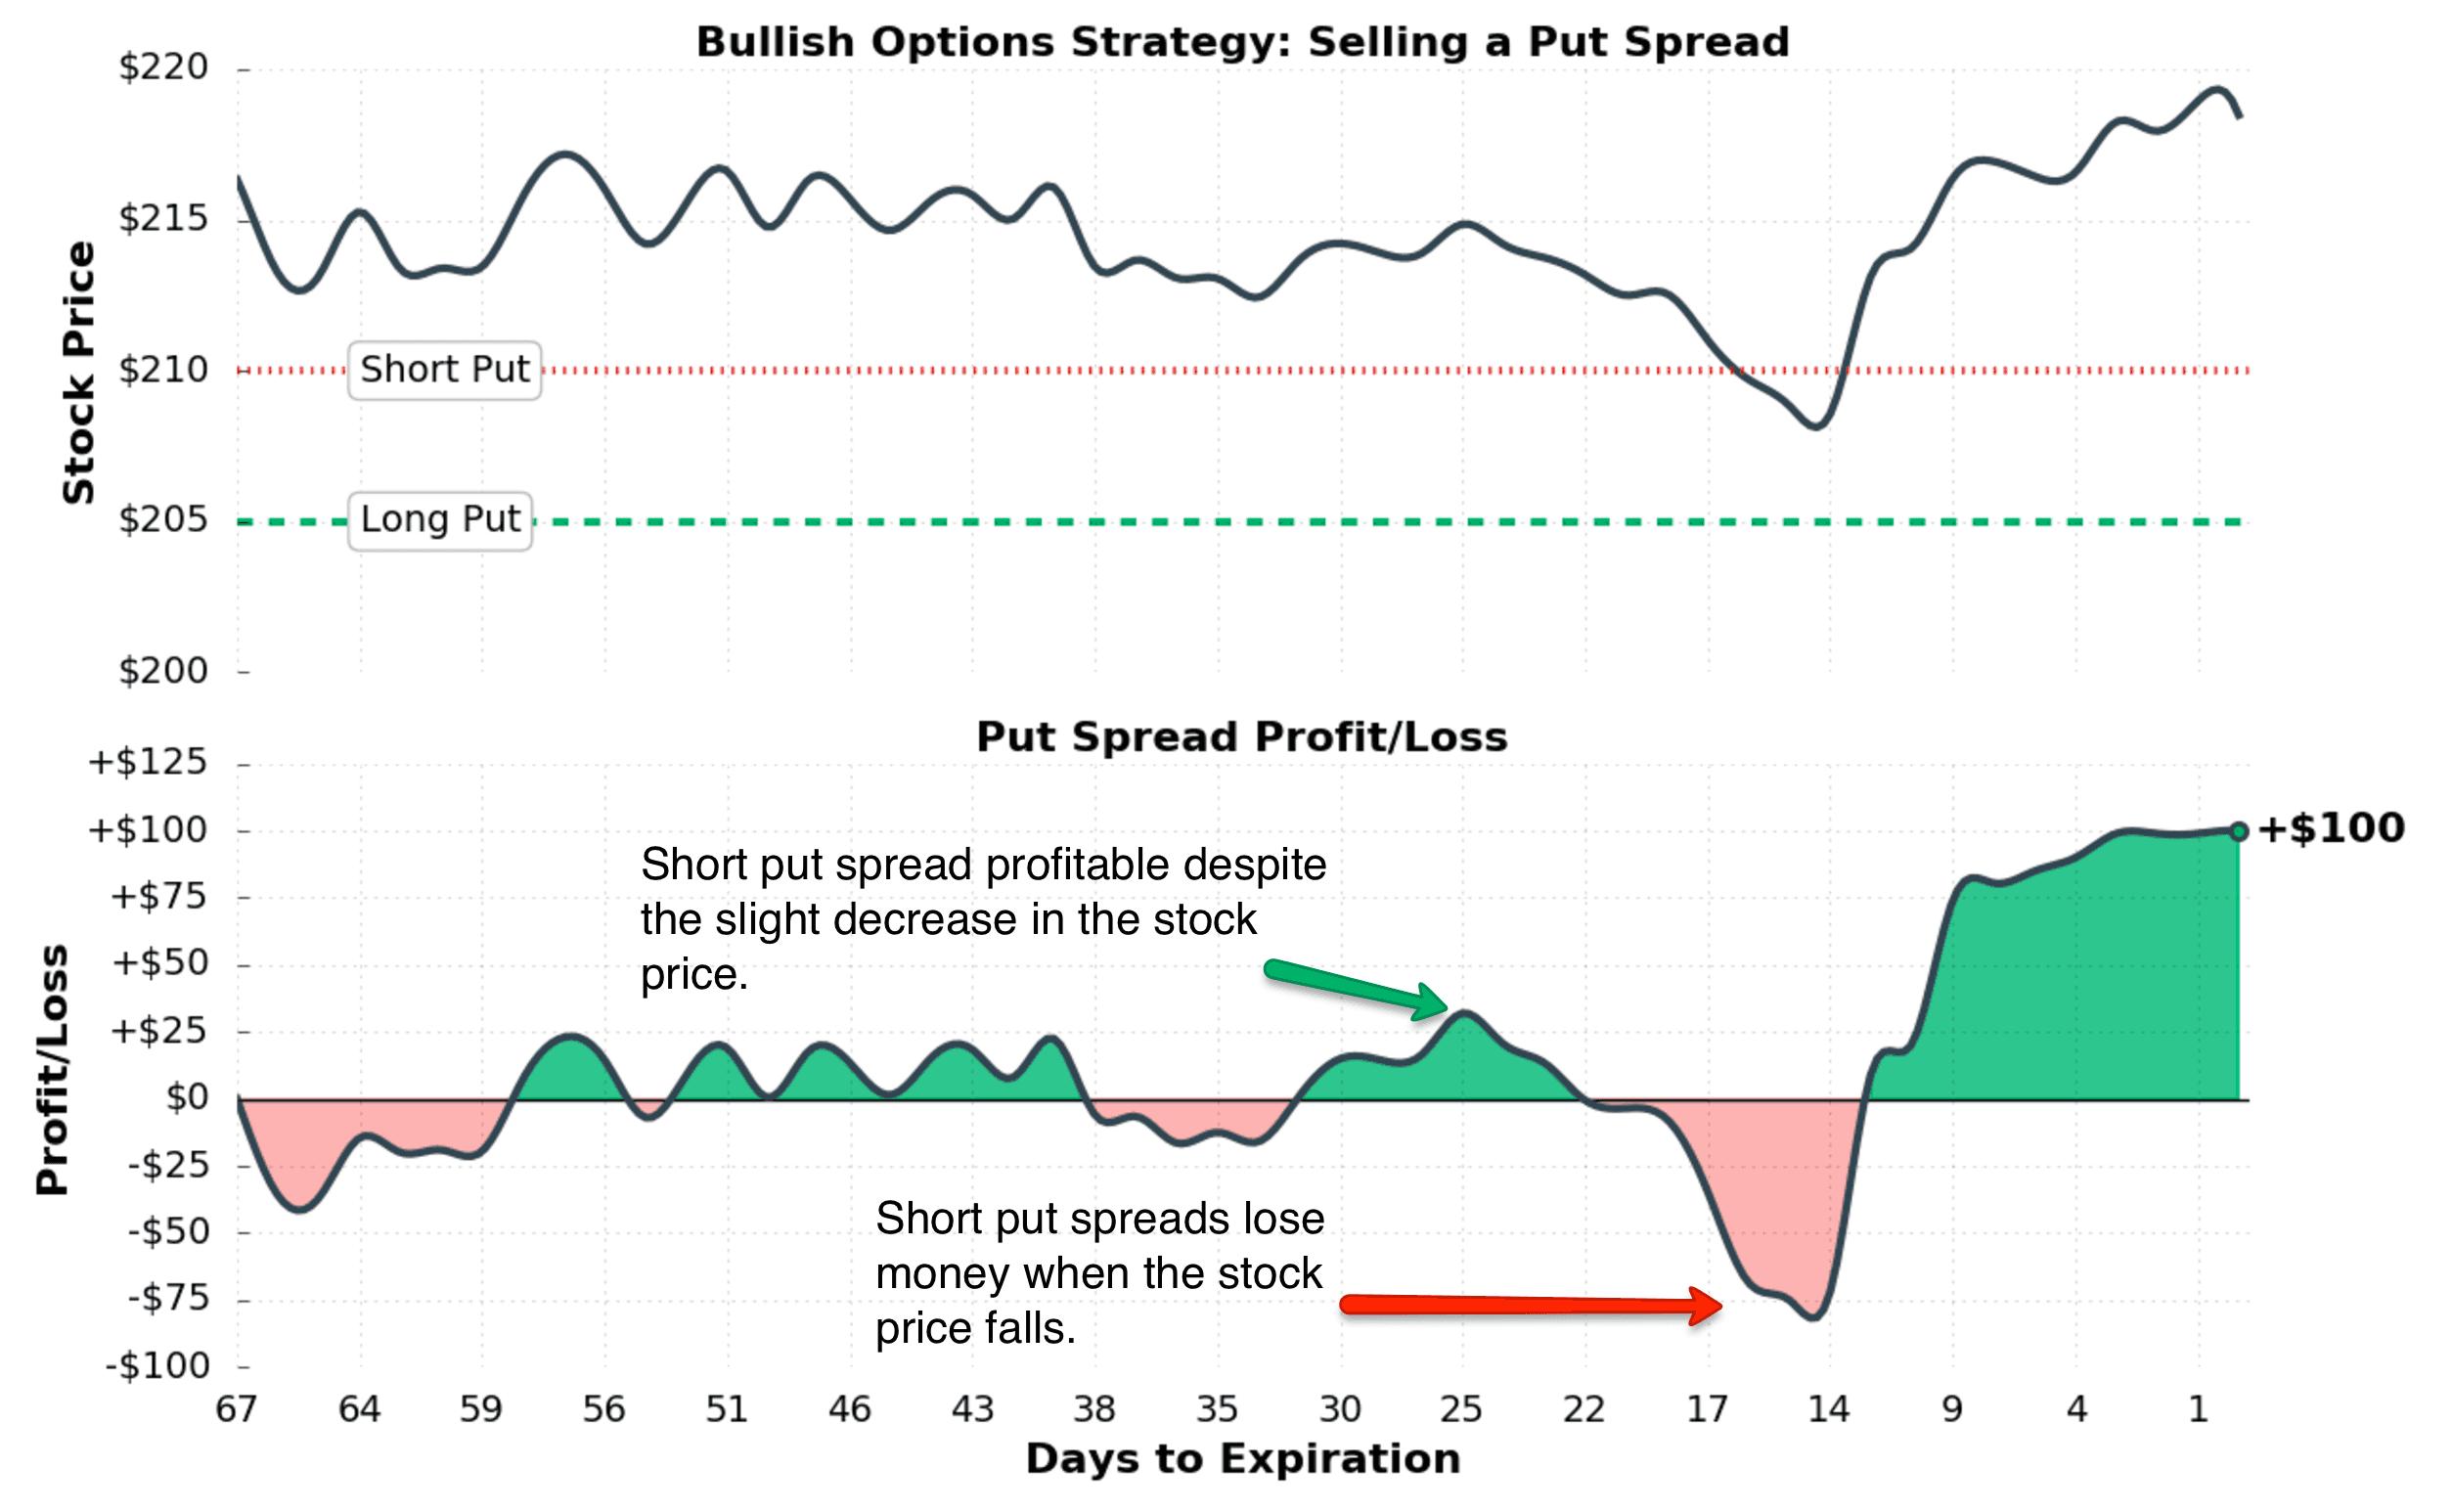 UK options trading strategies